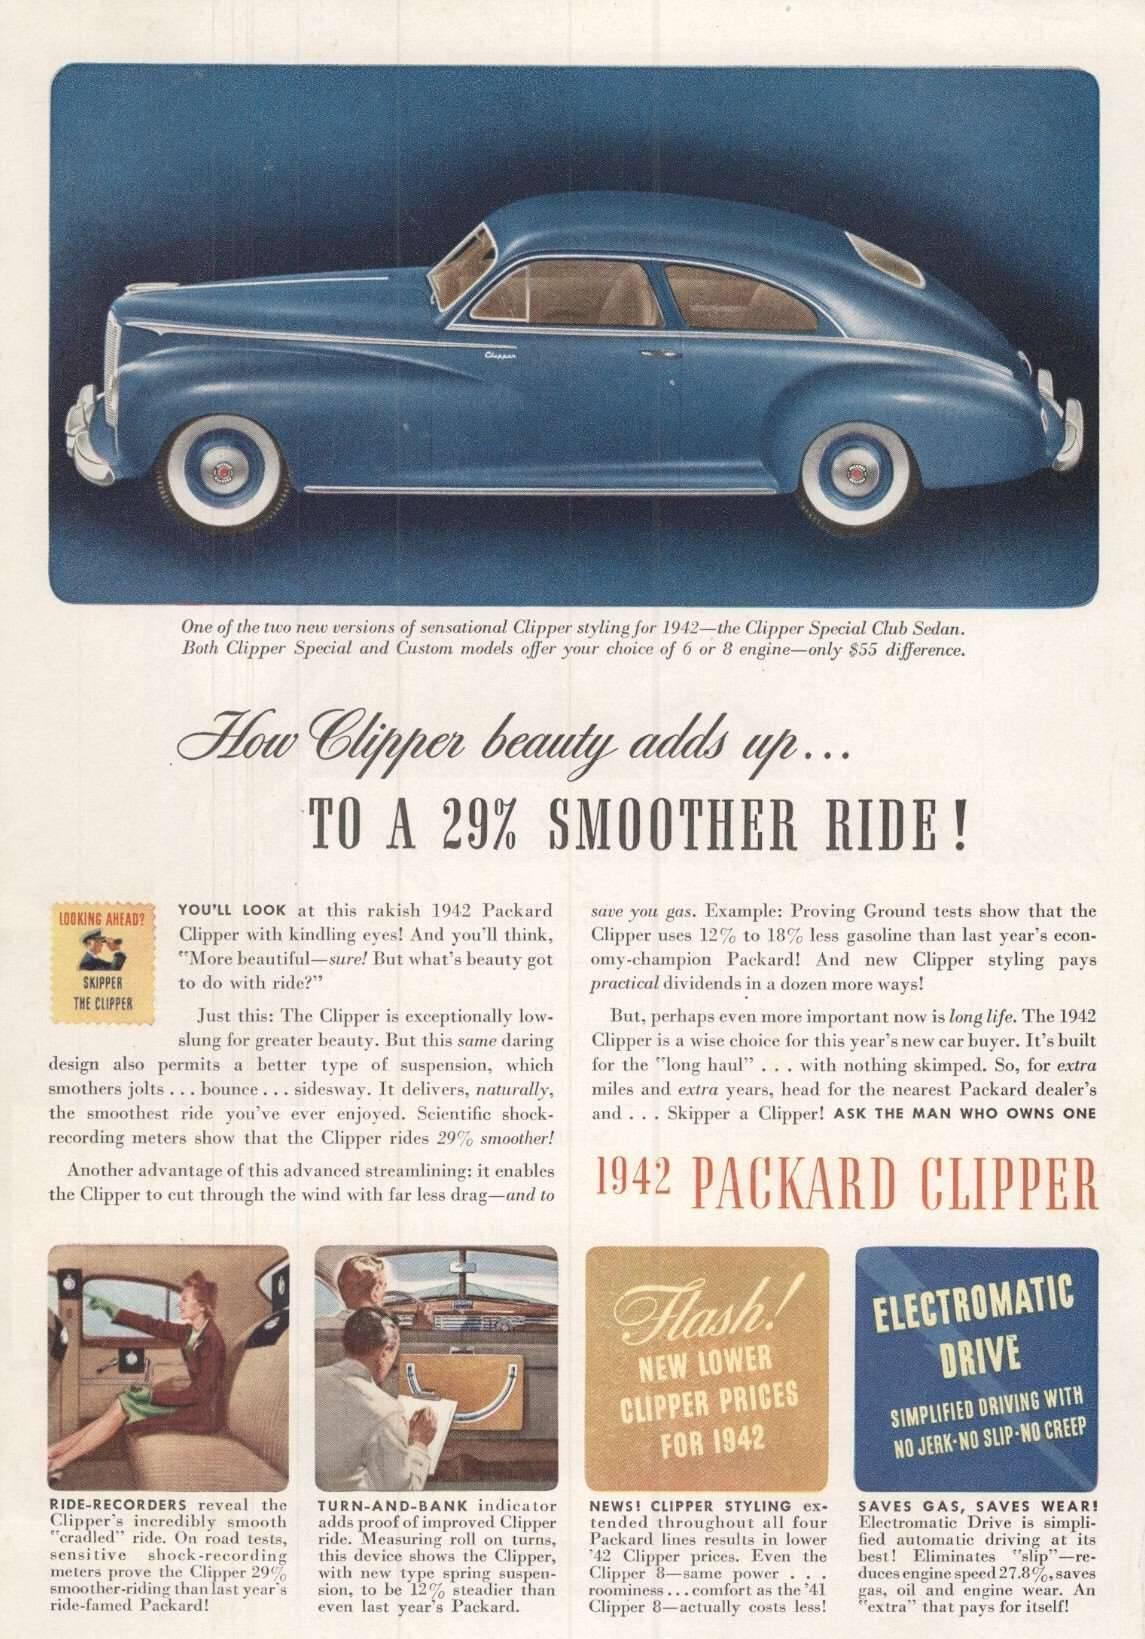 1942 Clipper Special Club Sedan - Advertisement